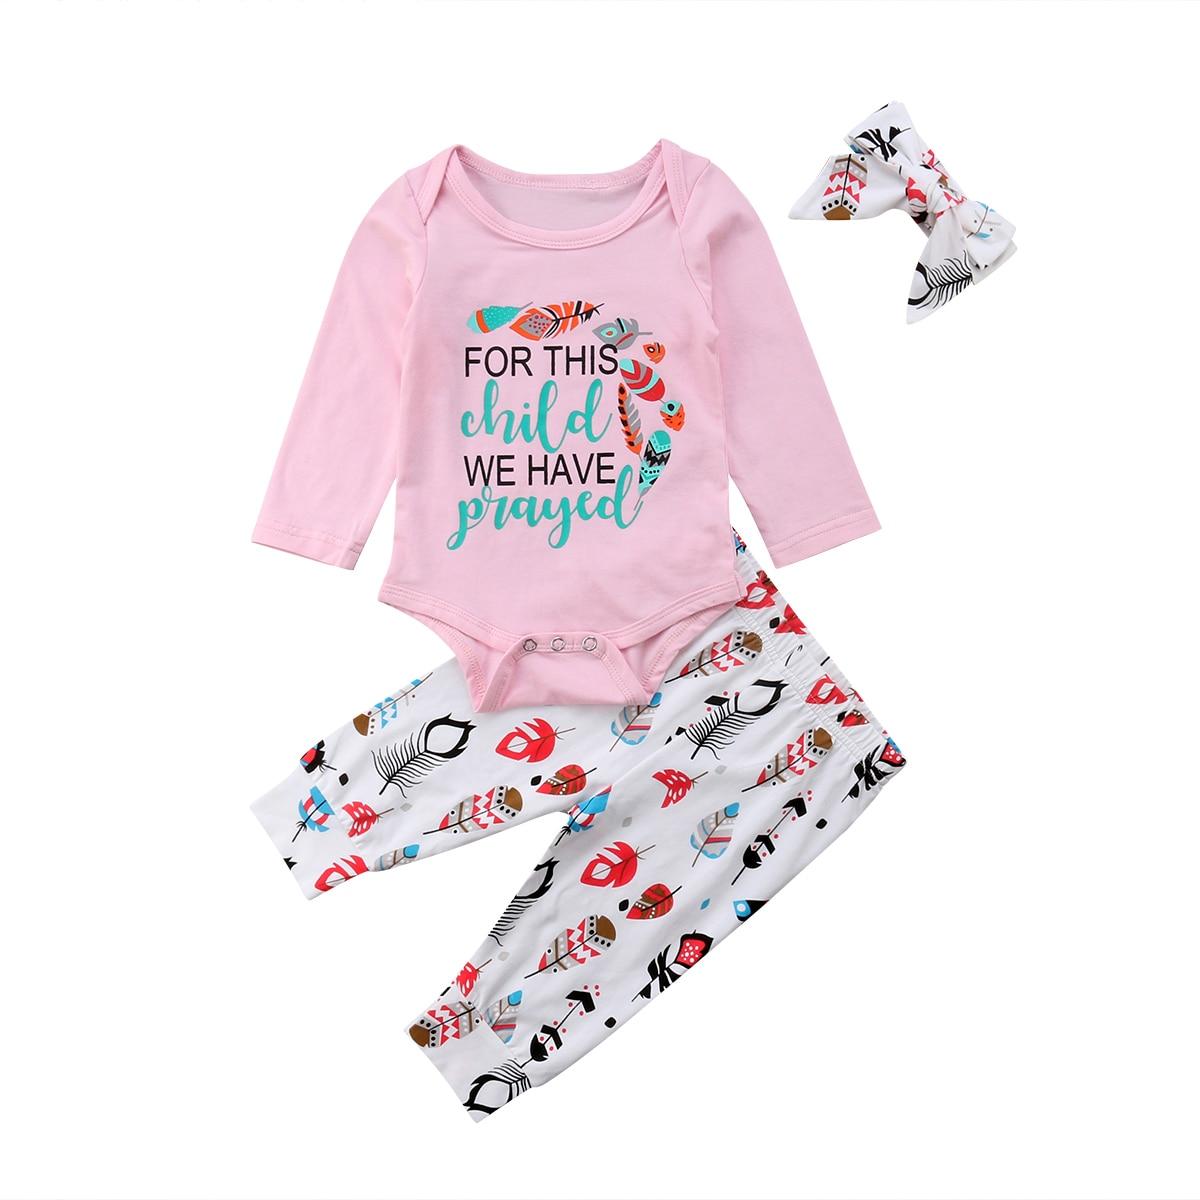 0-18 Mt Neugeborenes Baby Mädchen Langarm Baumwolle Strampler Tops + Druck Hose Legging Stirnband 3 Stücke Outfits Kleidung Set